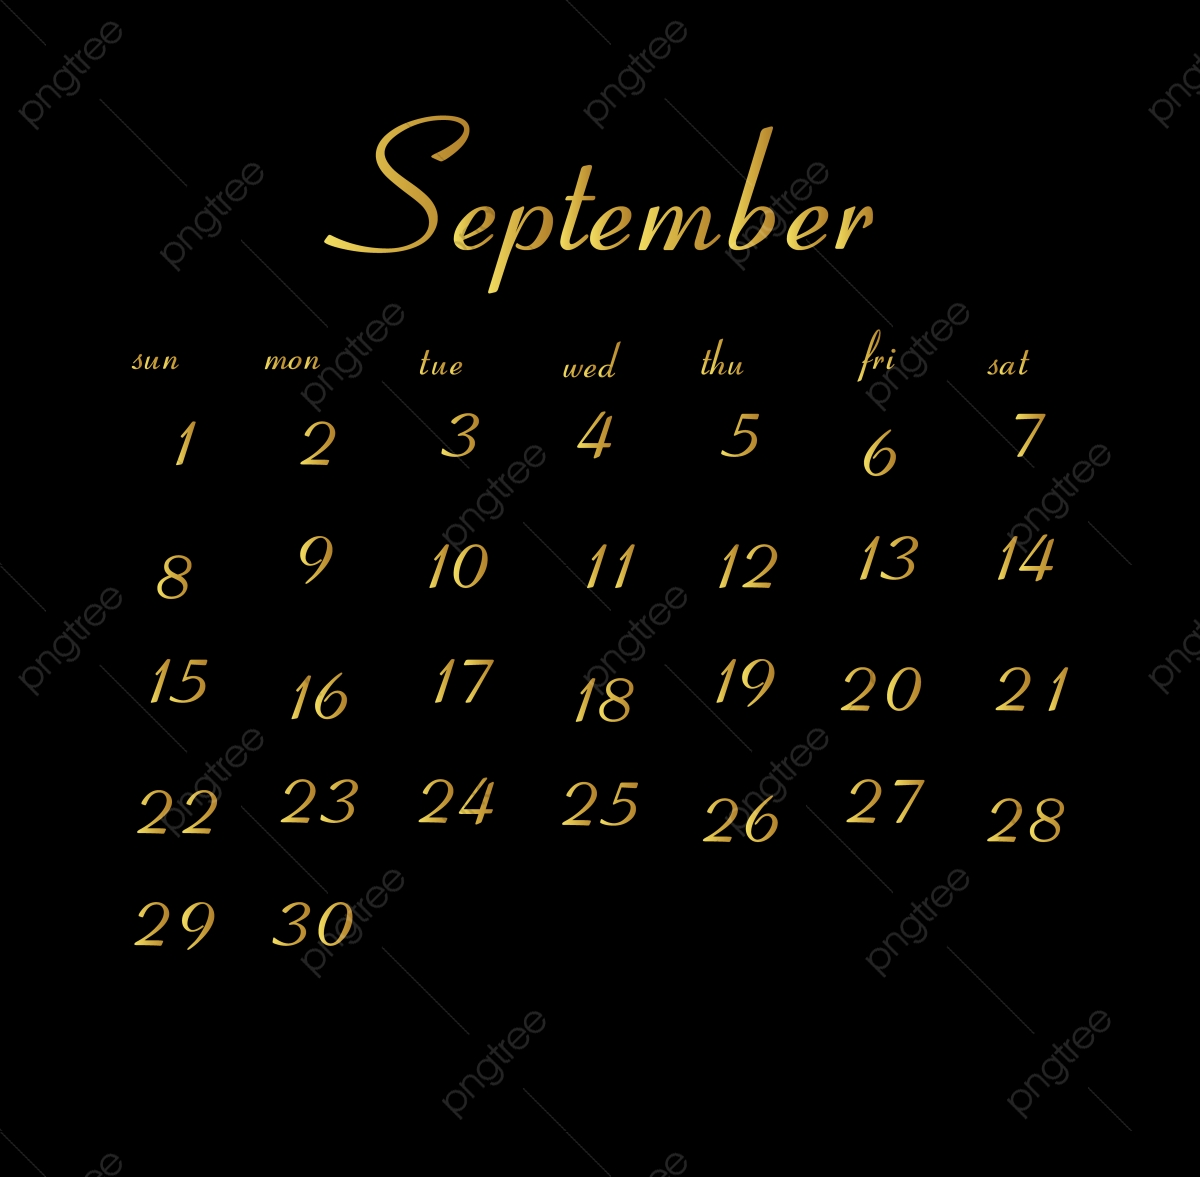 September 2019 Calendar Calendar Clean White PNG and Vector 1200x1177